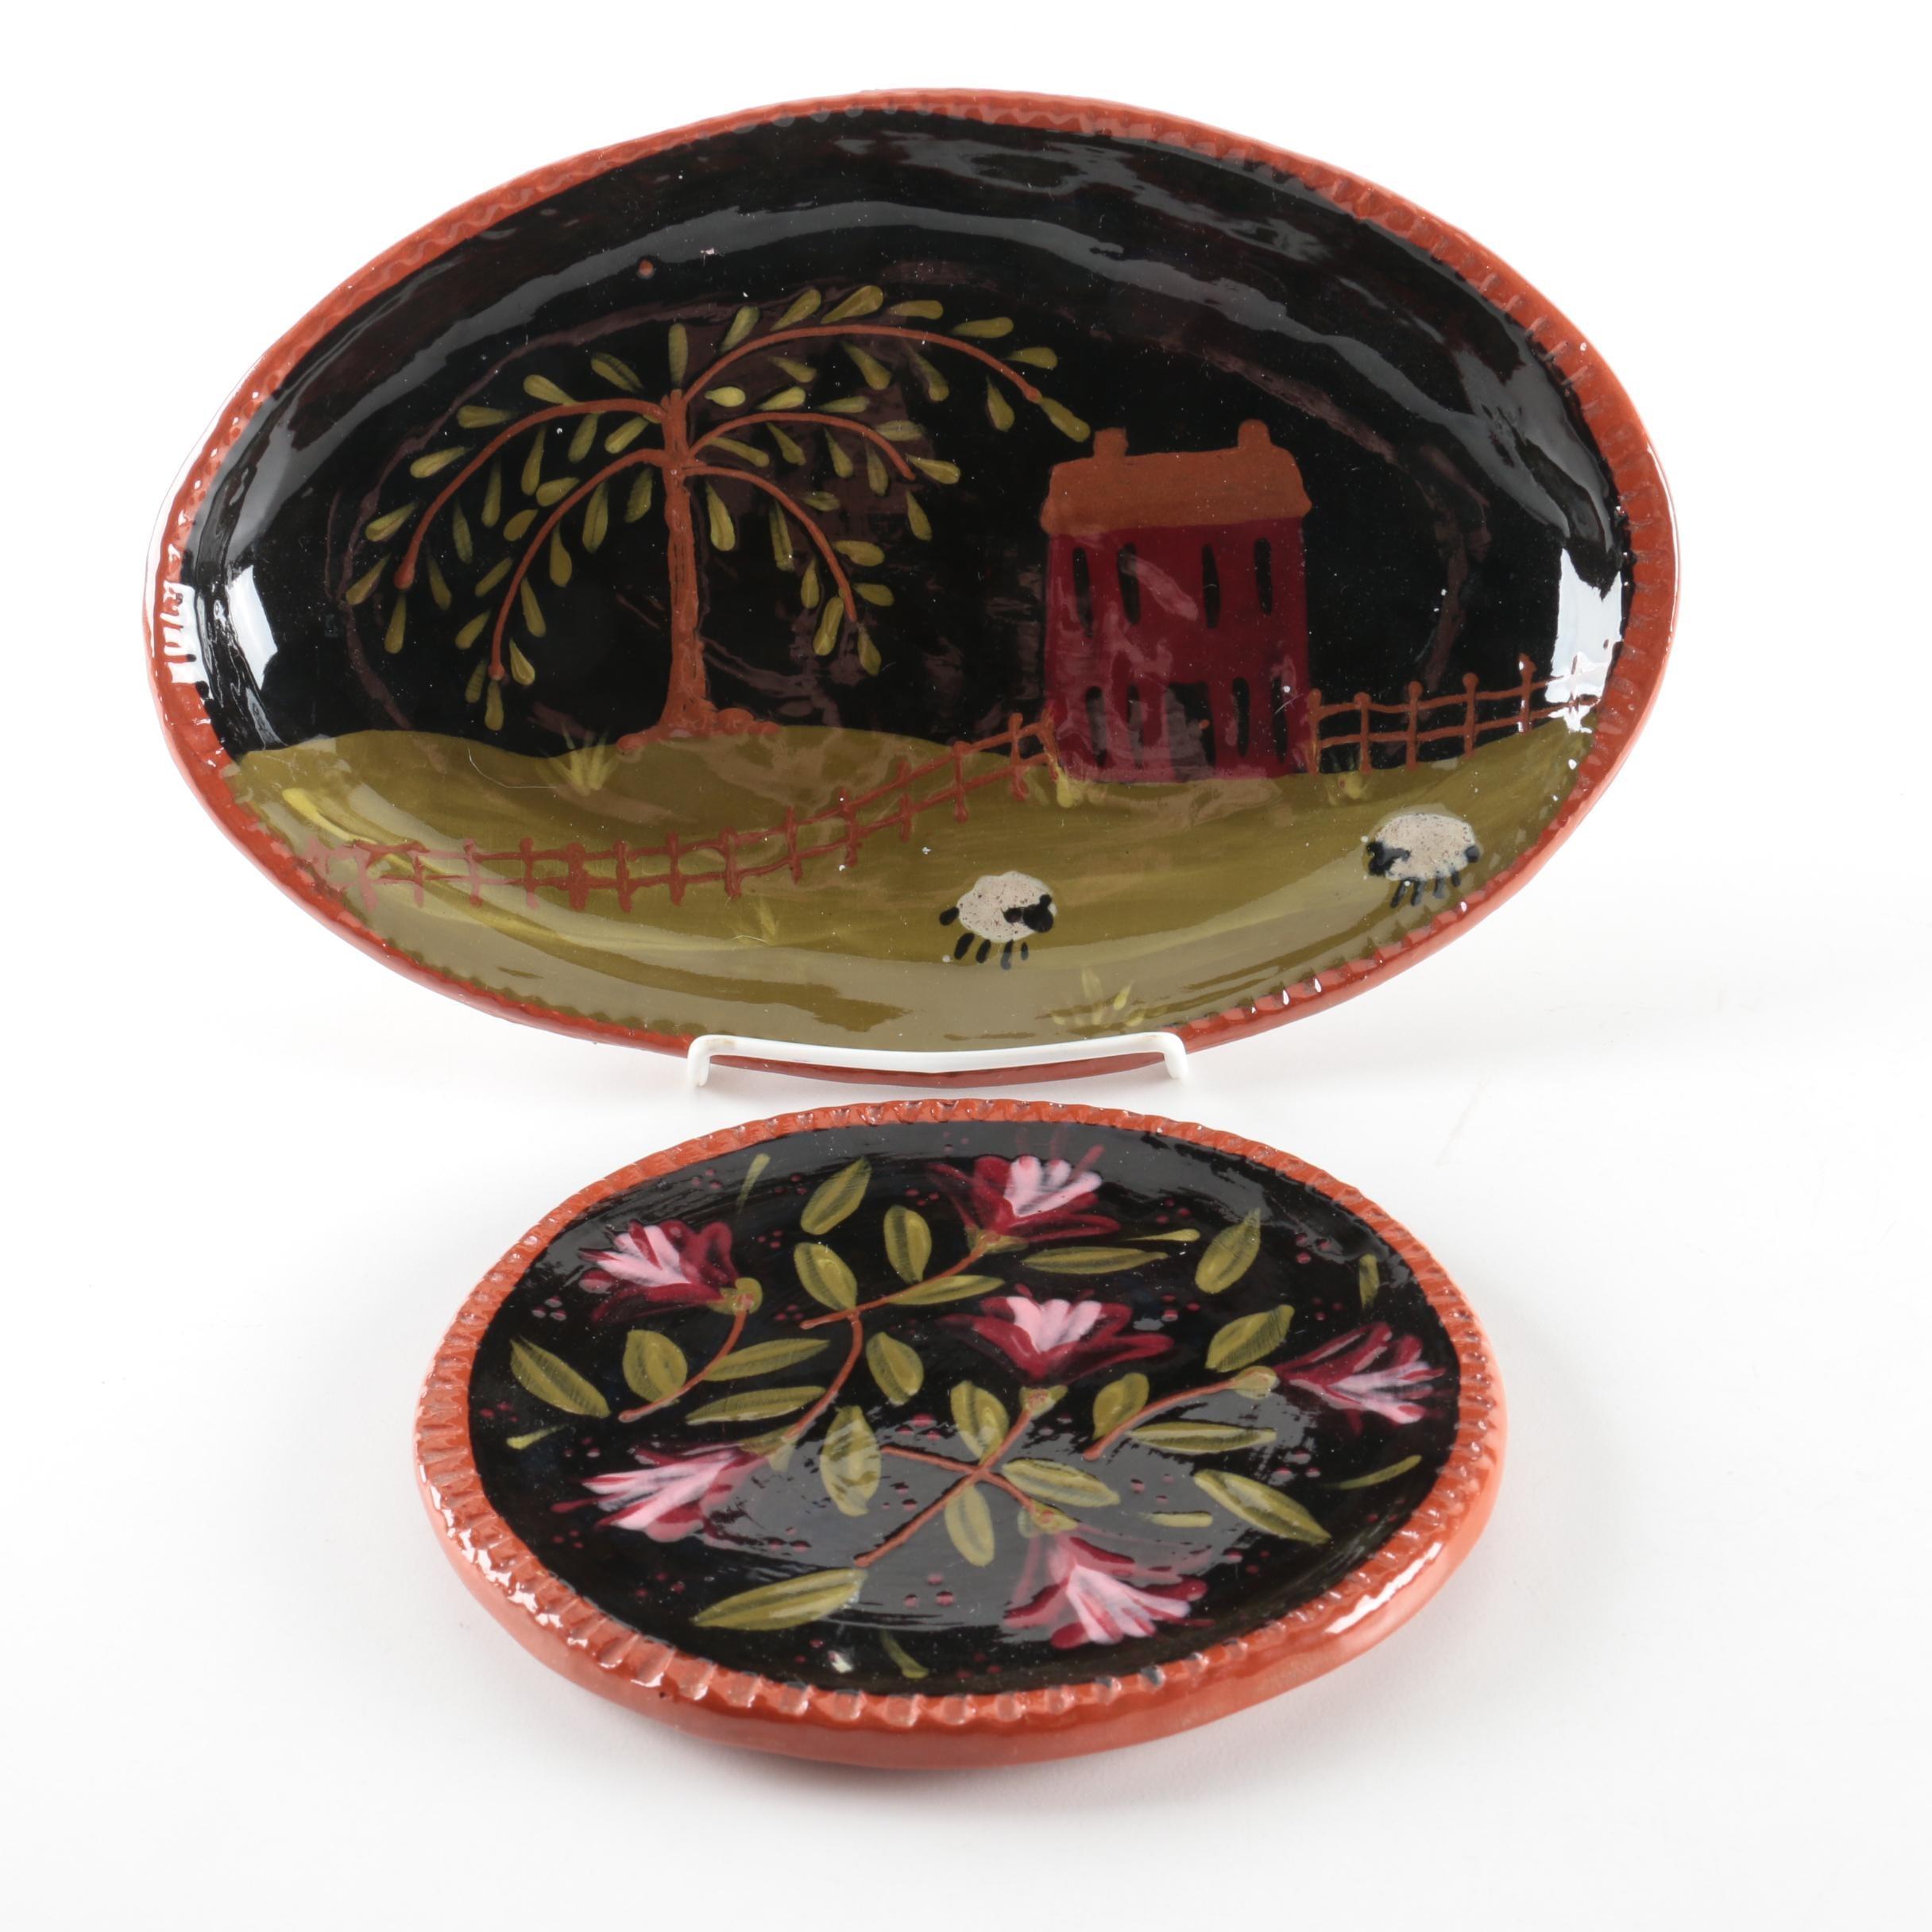 Penn Woods Pottery Redware Serving Platters